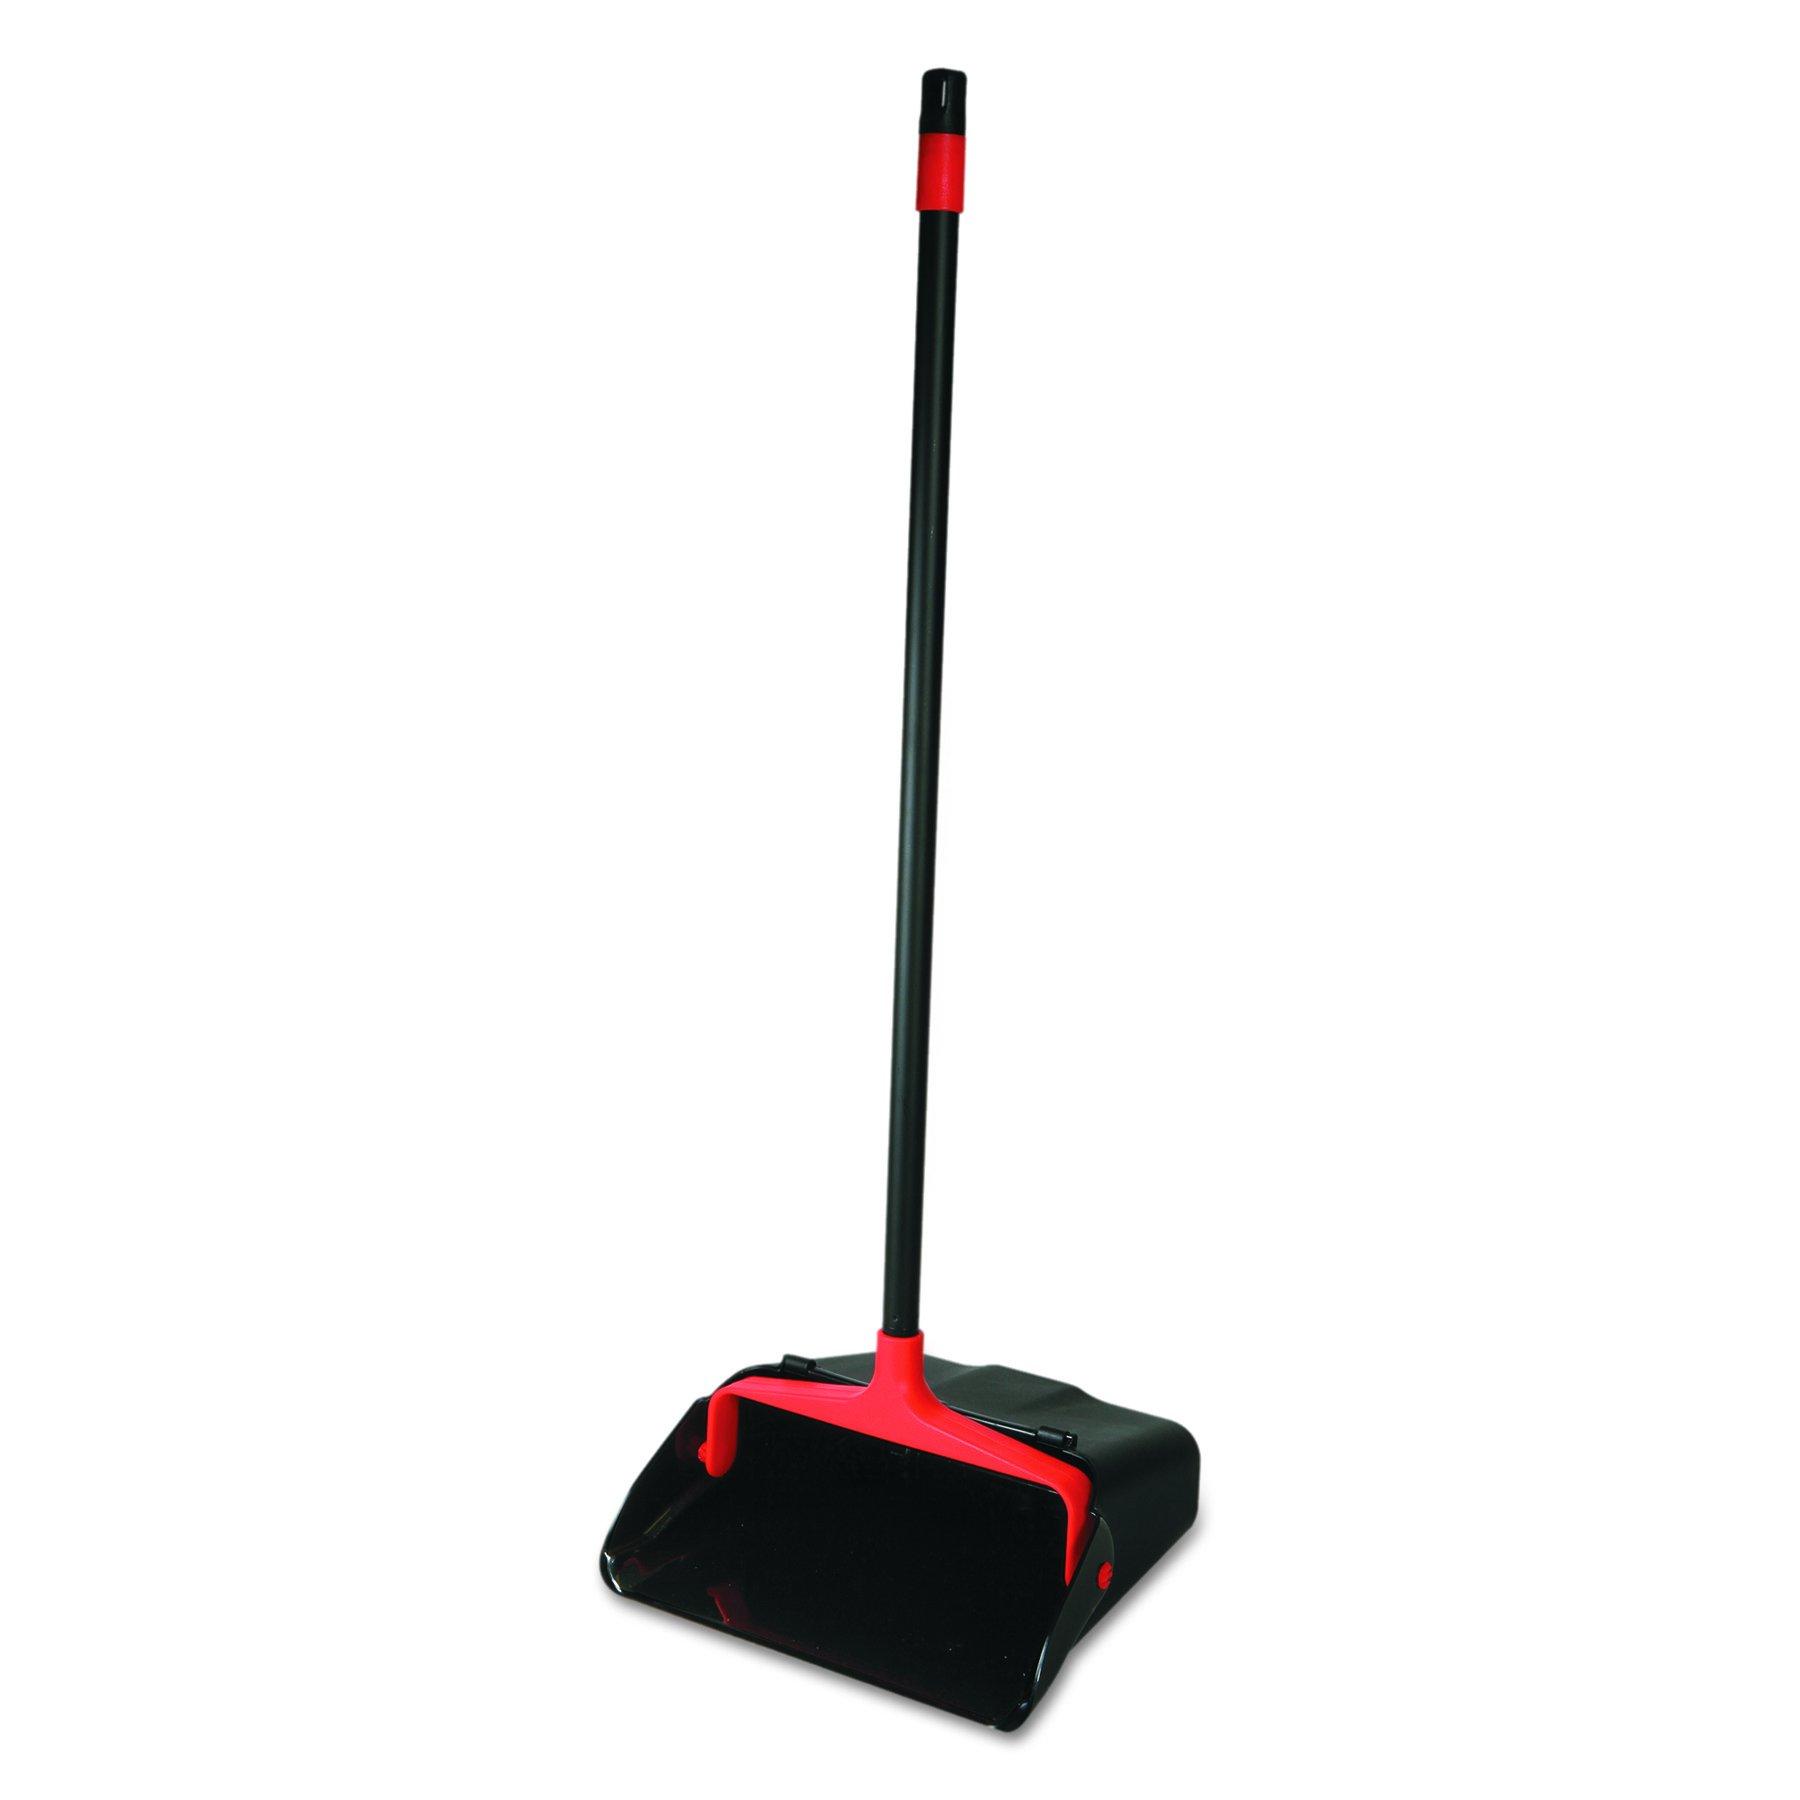 O-Cedar Commercial CB962082 Maxi-Plus Lobby Dust Pan with Rear Wheels, Black, 13''Wide, 30''Handle (Case of 6)